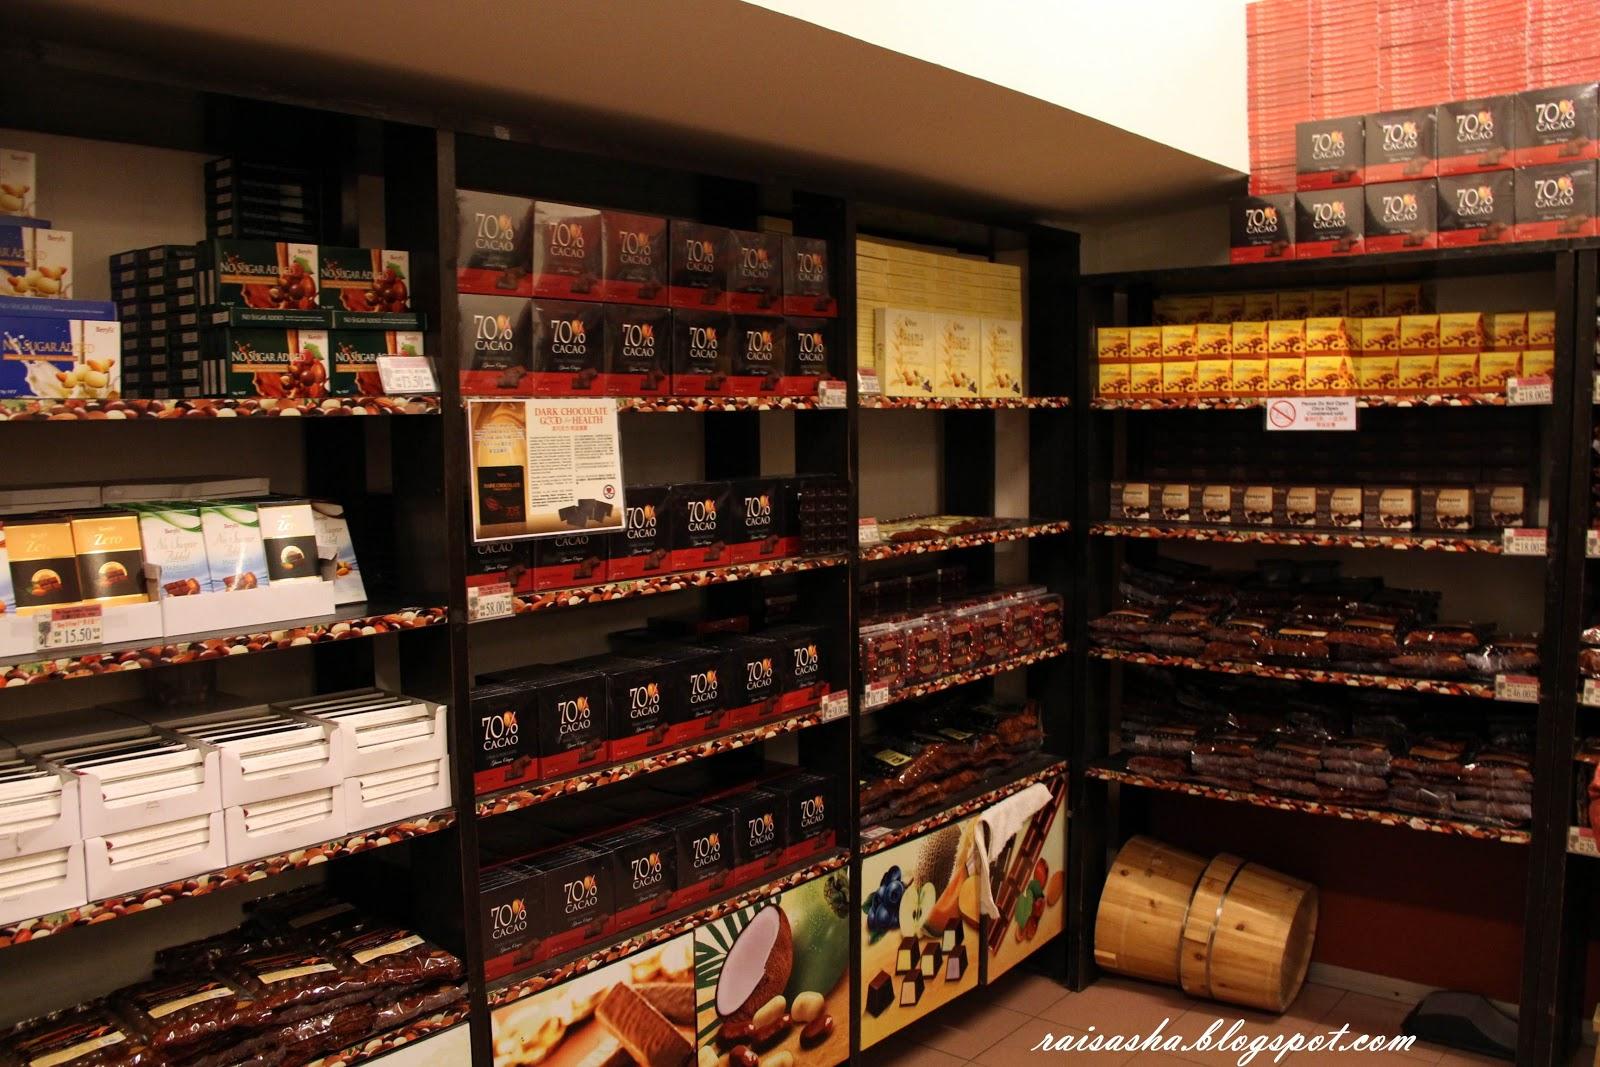 Beryl's chocolate warehouse sale at Seri Kembangan & Bangi from 6 – 25 Jan 2017